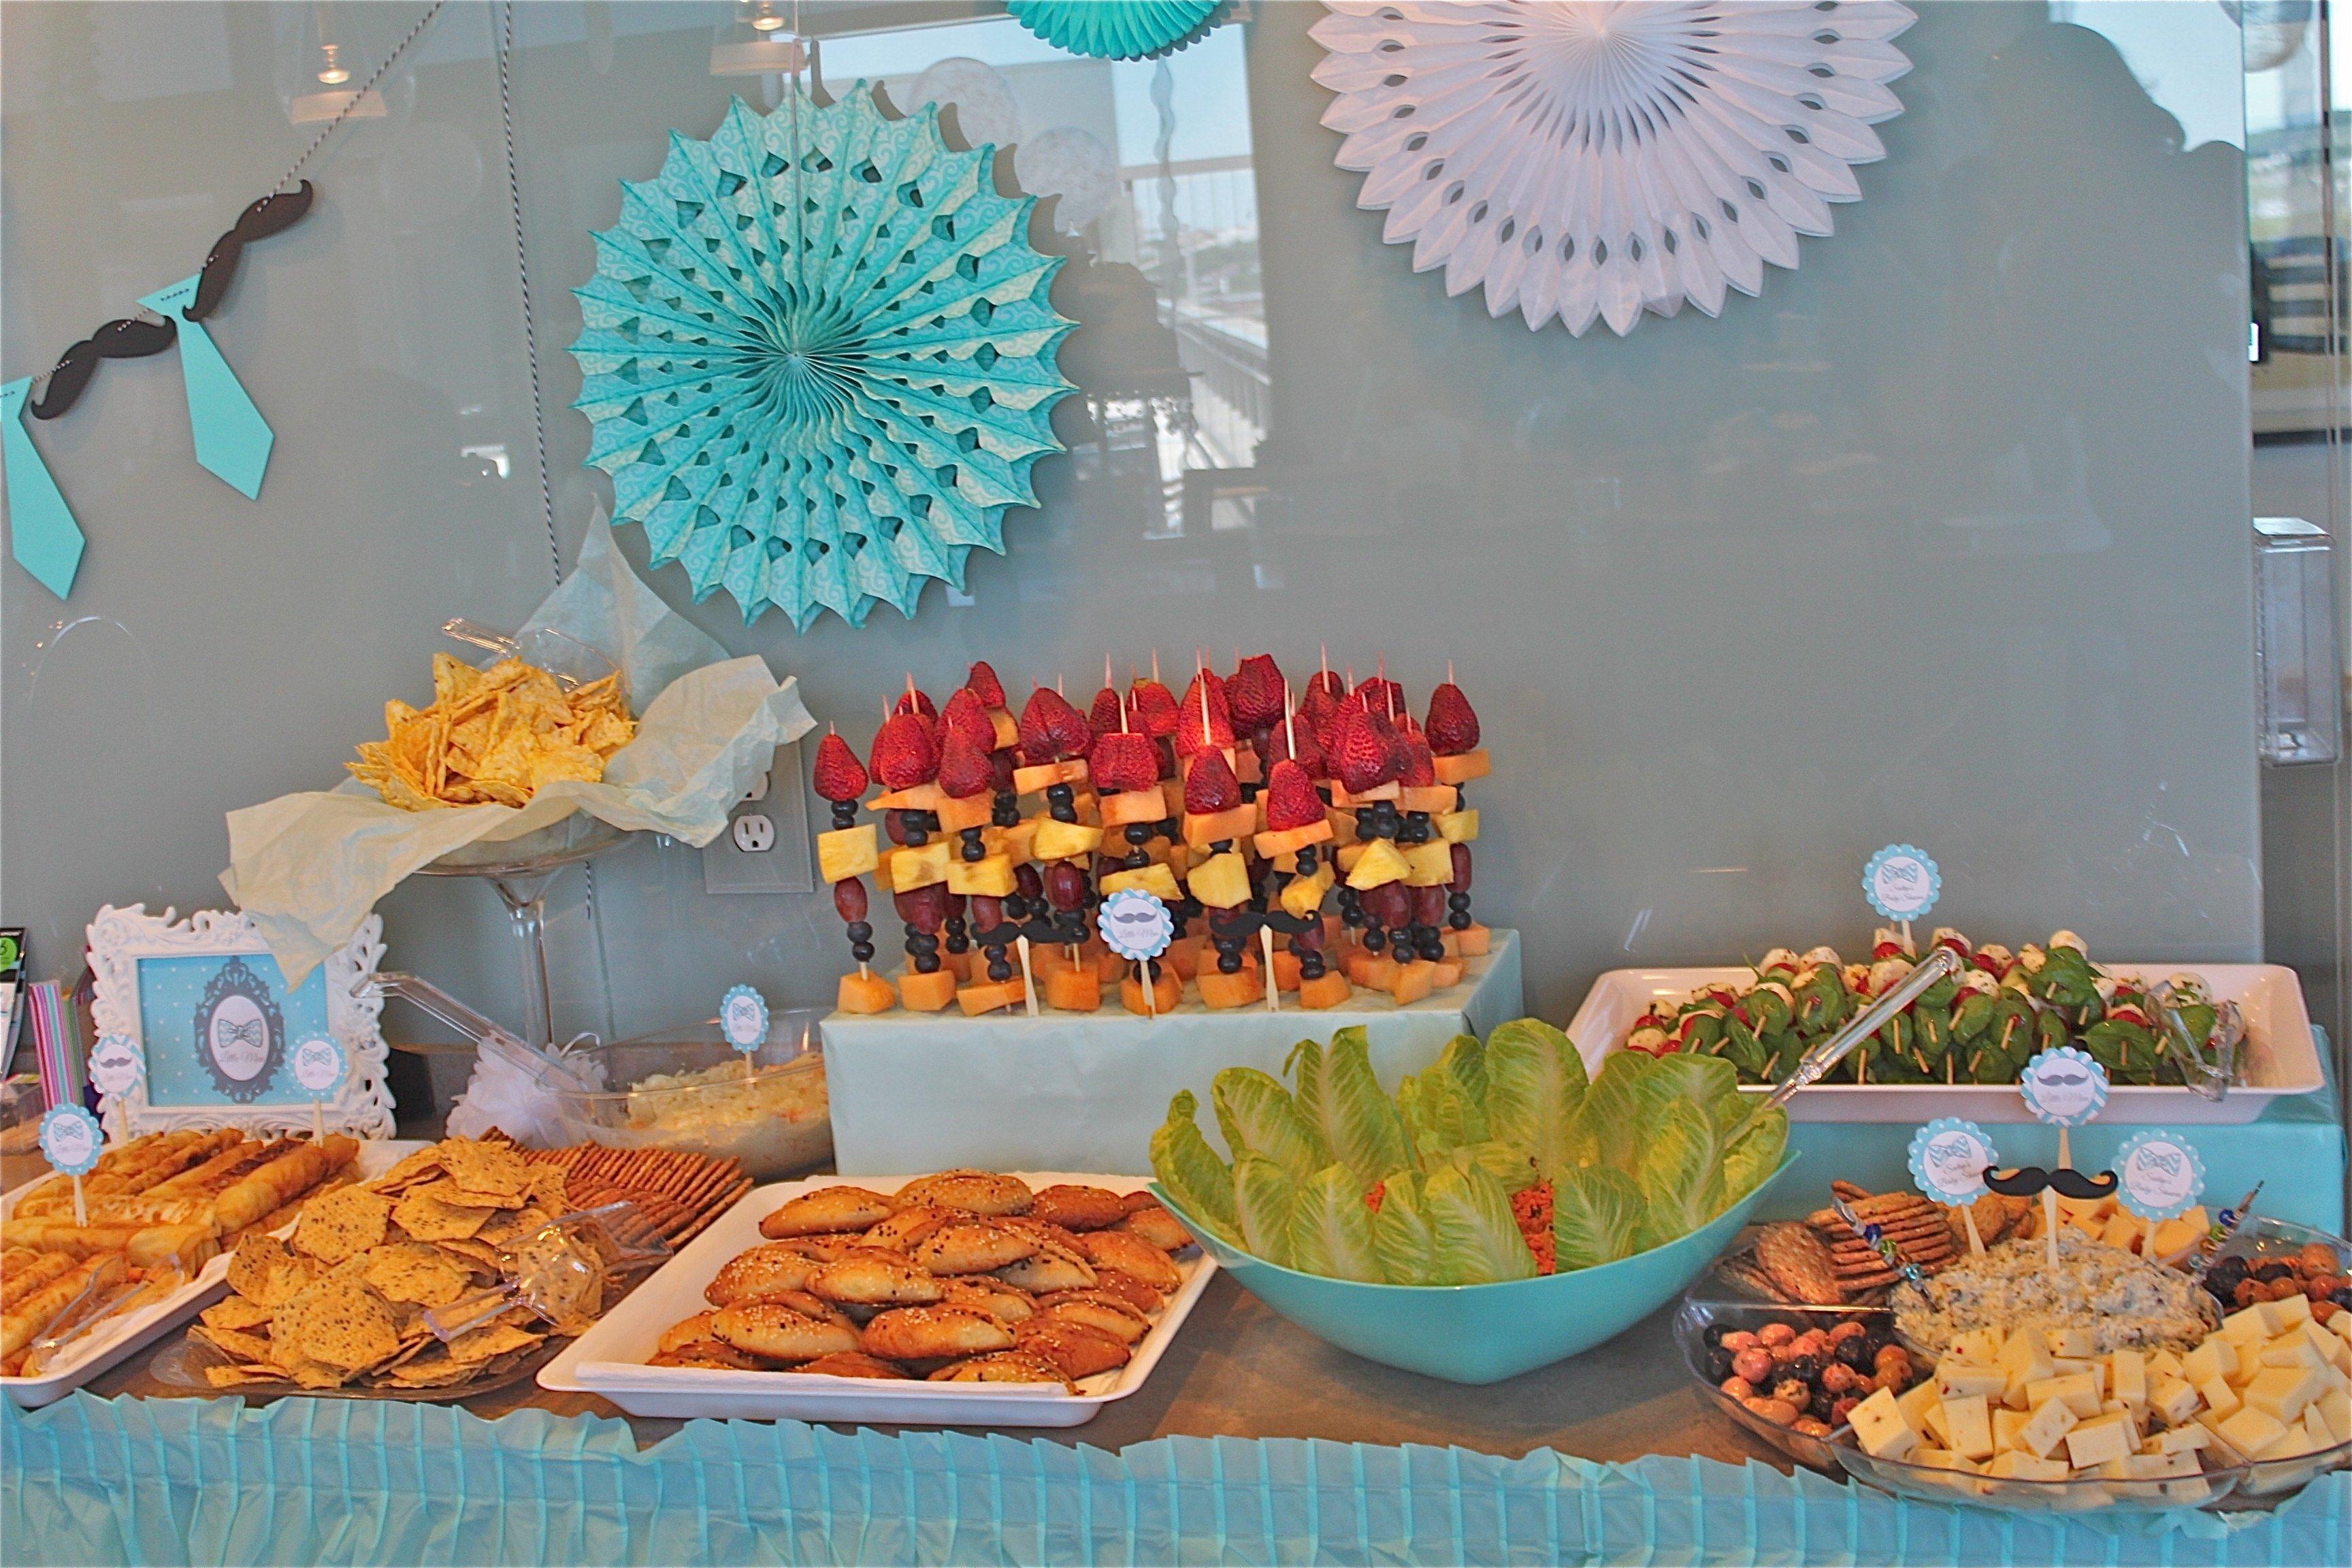 10 cute creative bridal shower food ideas baby boy shower food ideas omega center ideas for